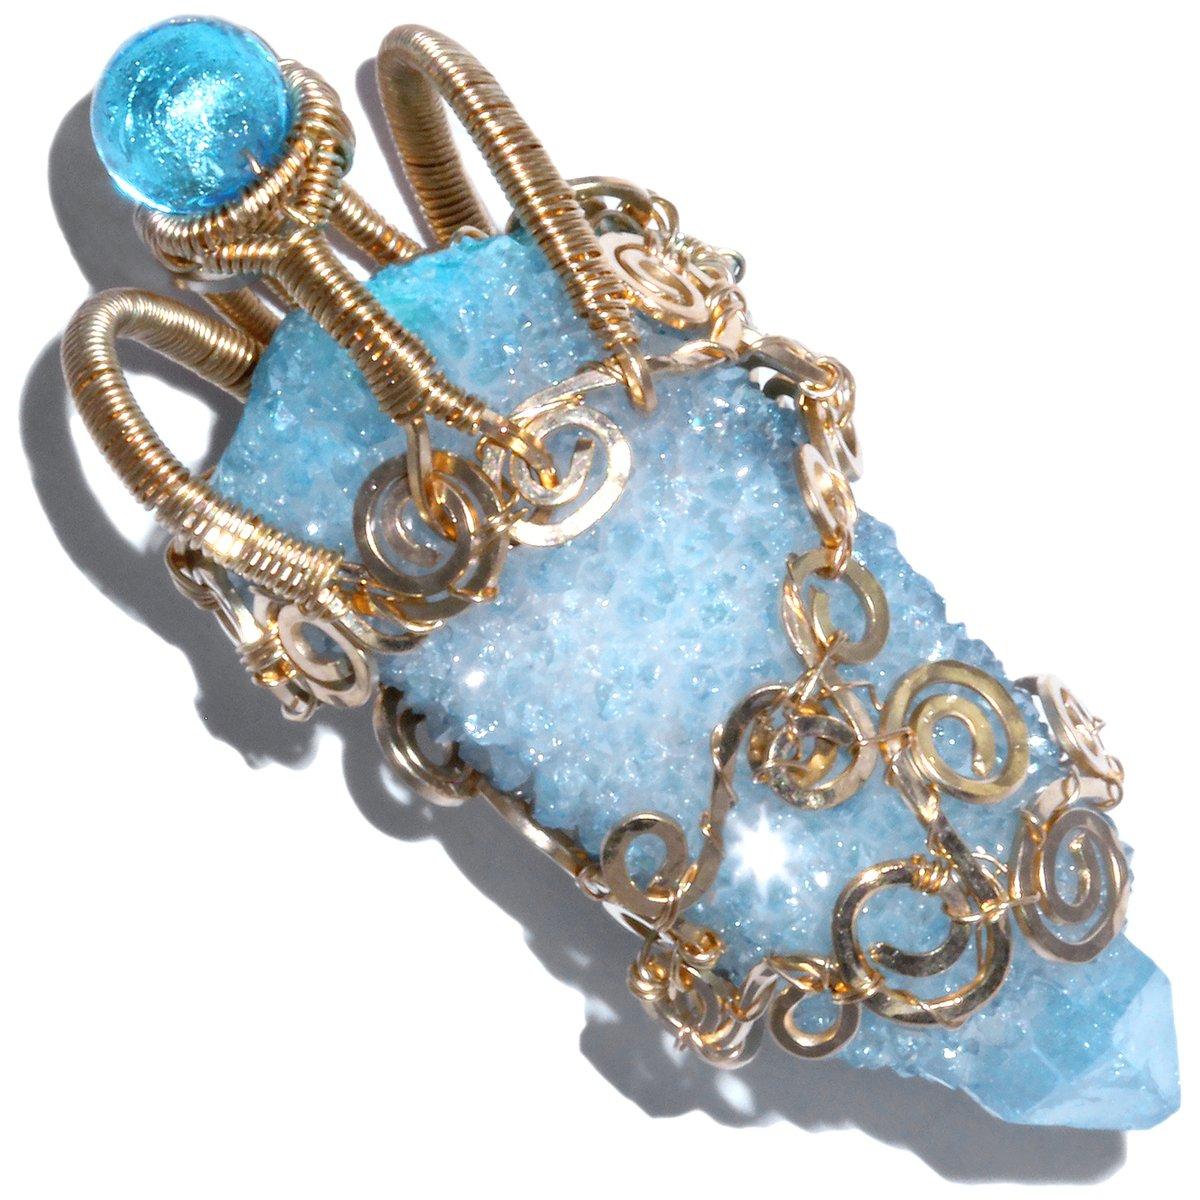 Aqua Aura Spirit Quartz Crystal 14K GF Handmade Filigree Pendant